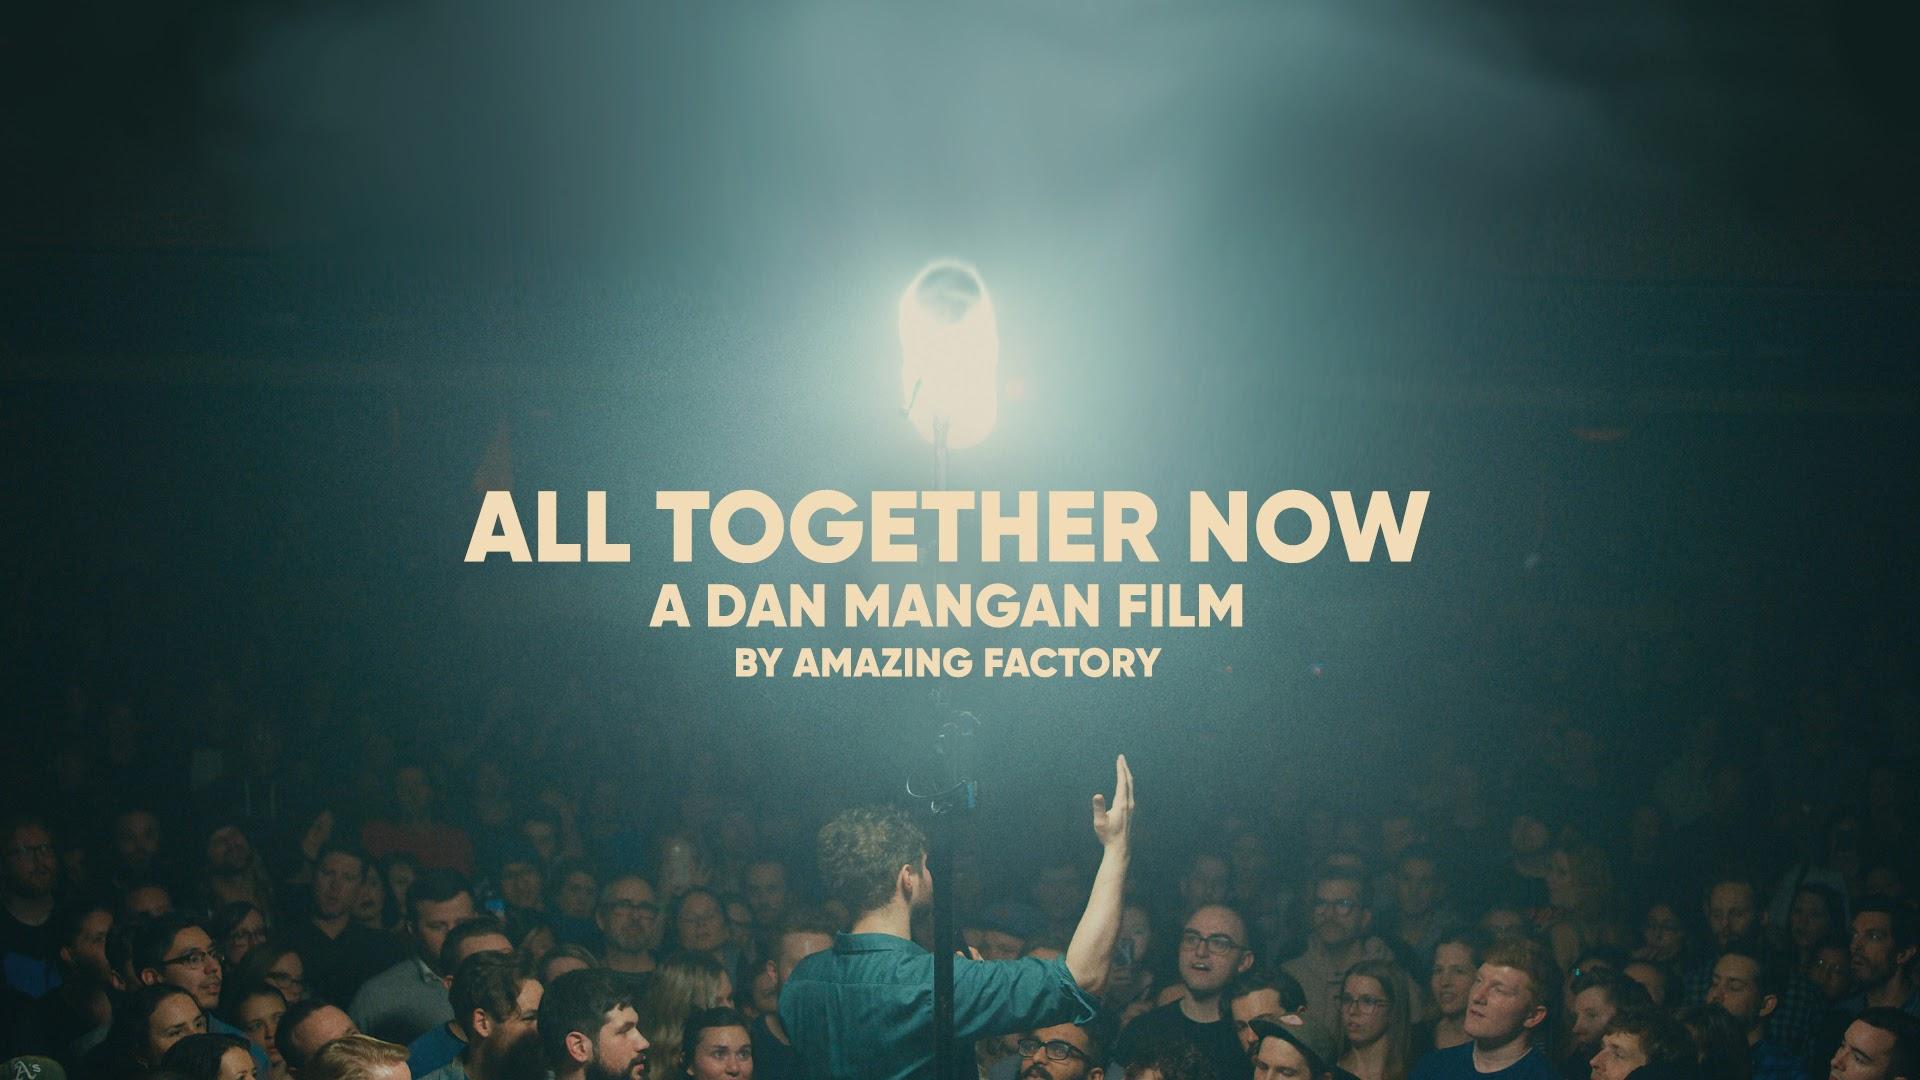 All Together Now: A Dan Mangan Film